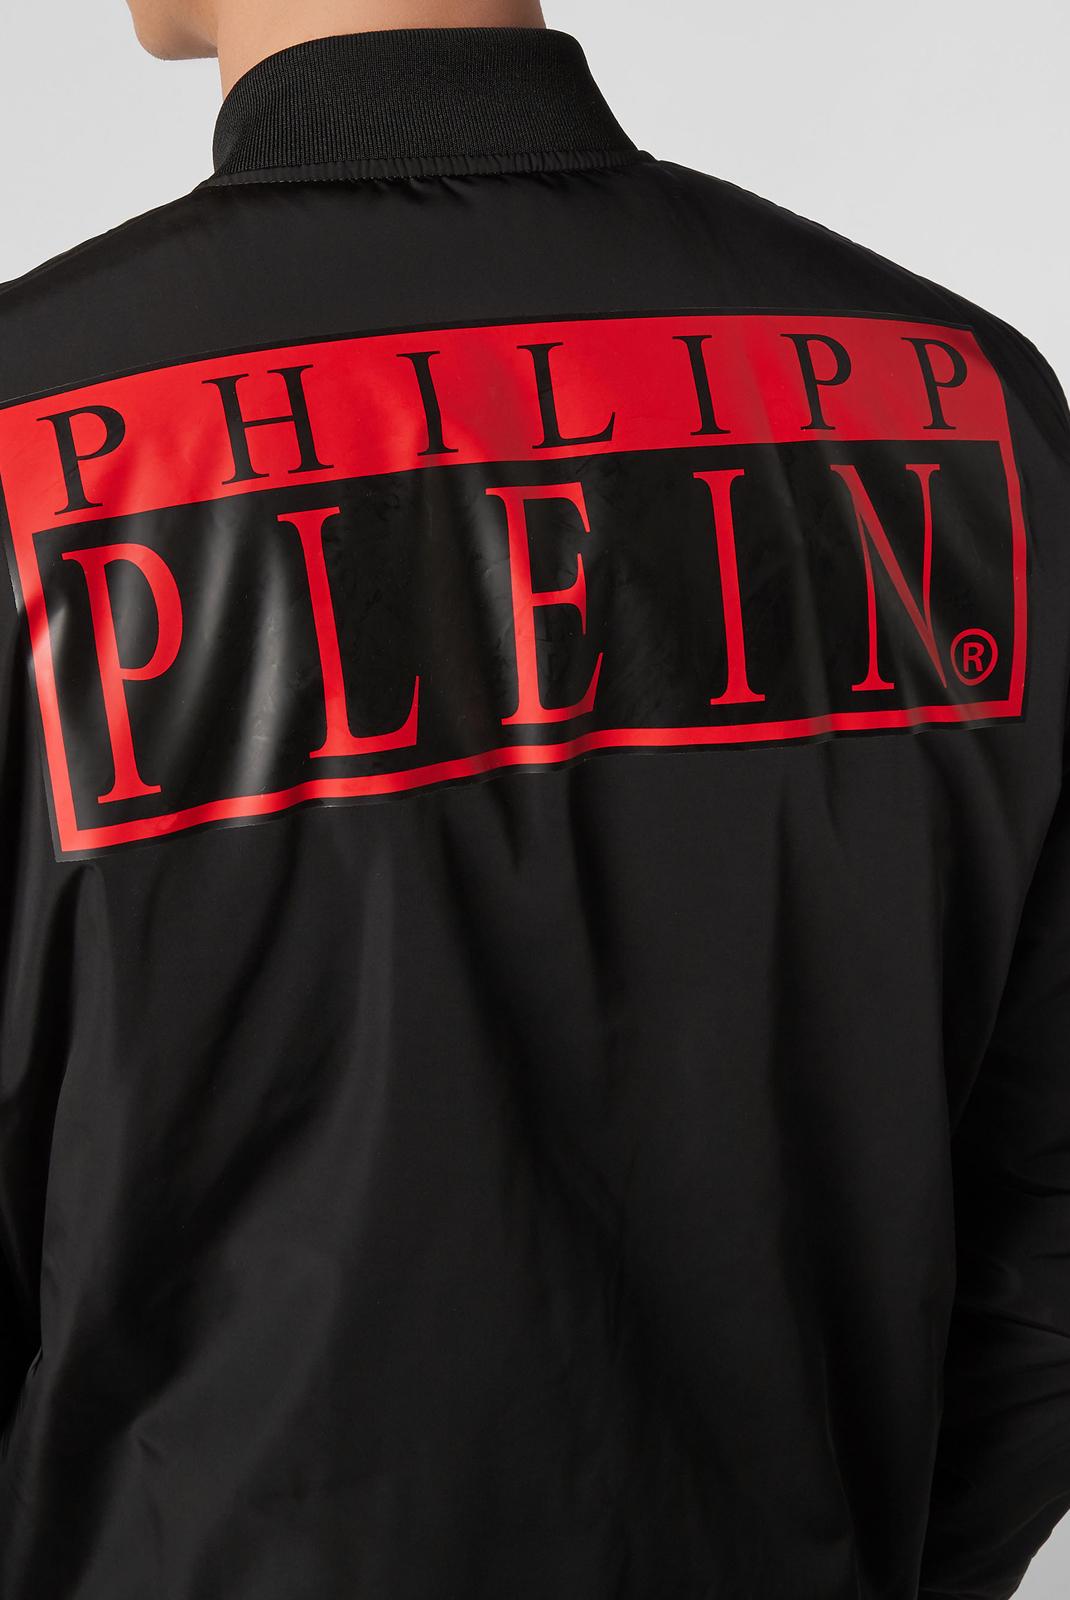 Blousons / doudounes  Philipp plein MRB1550 0213 BLACK/RED